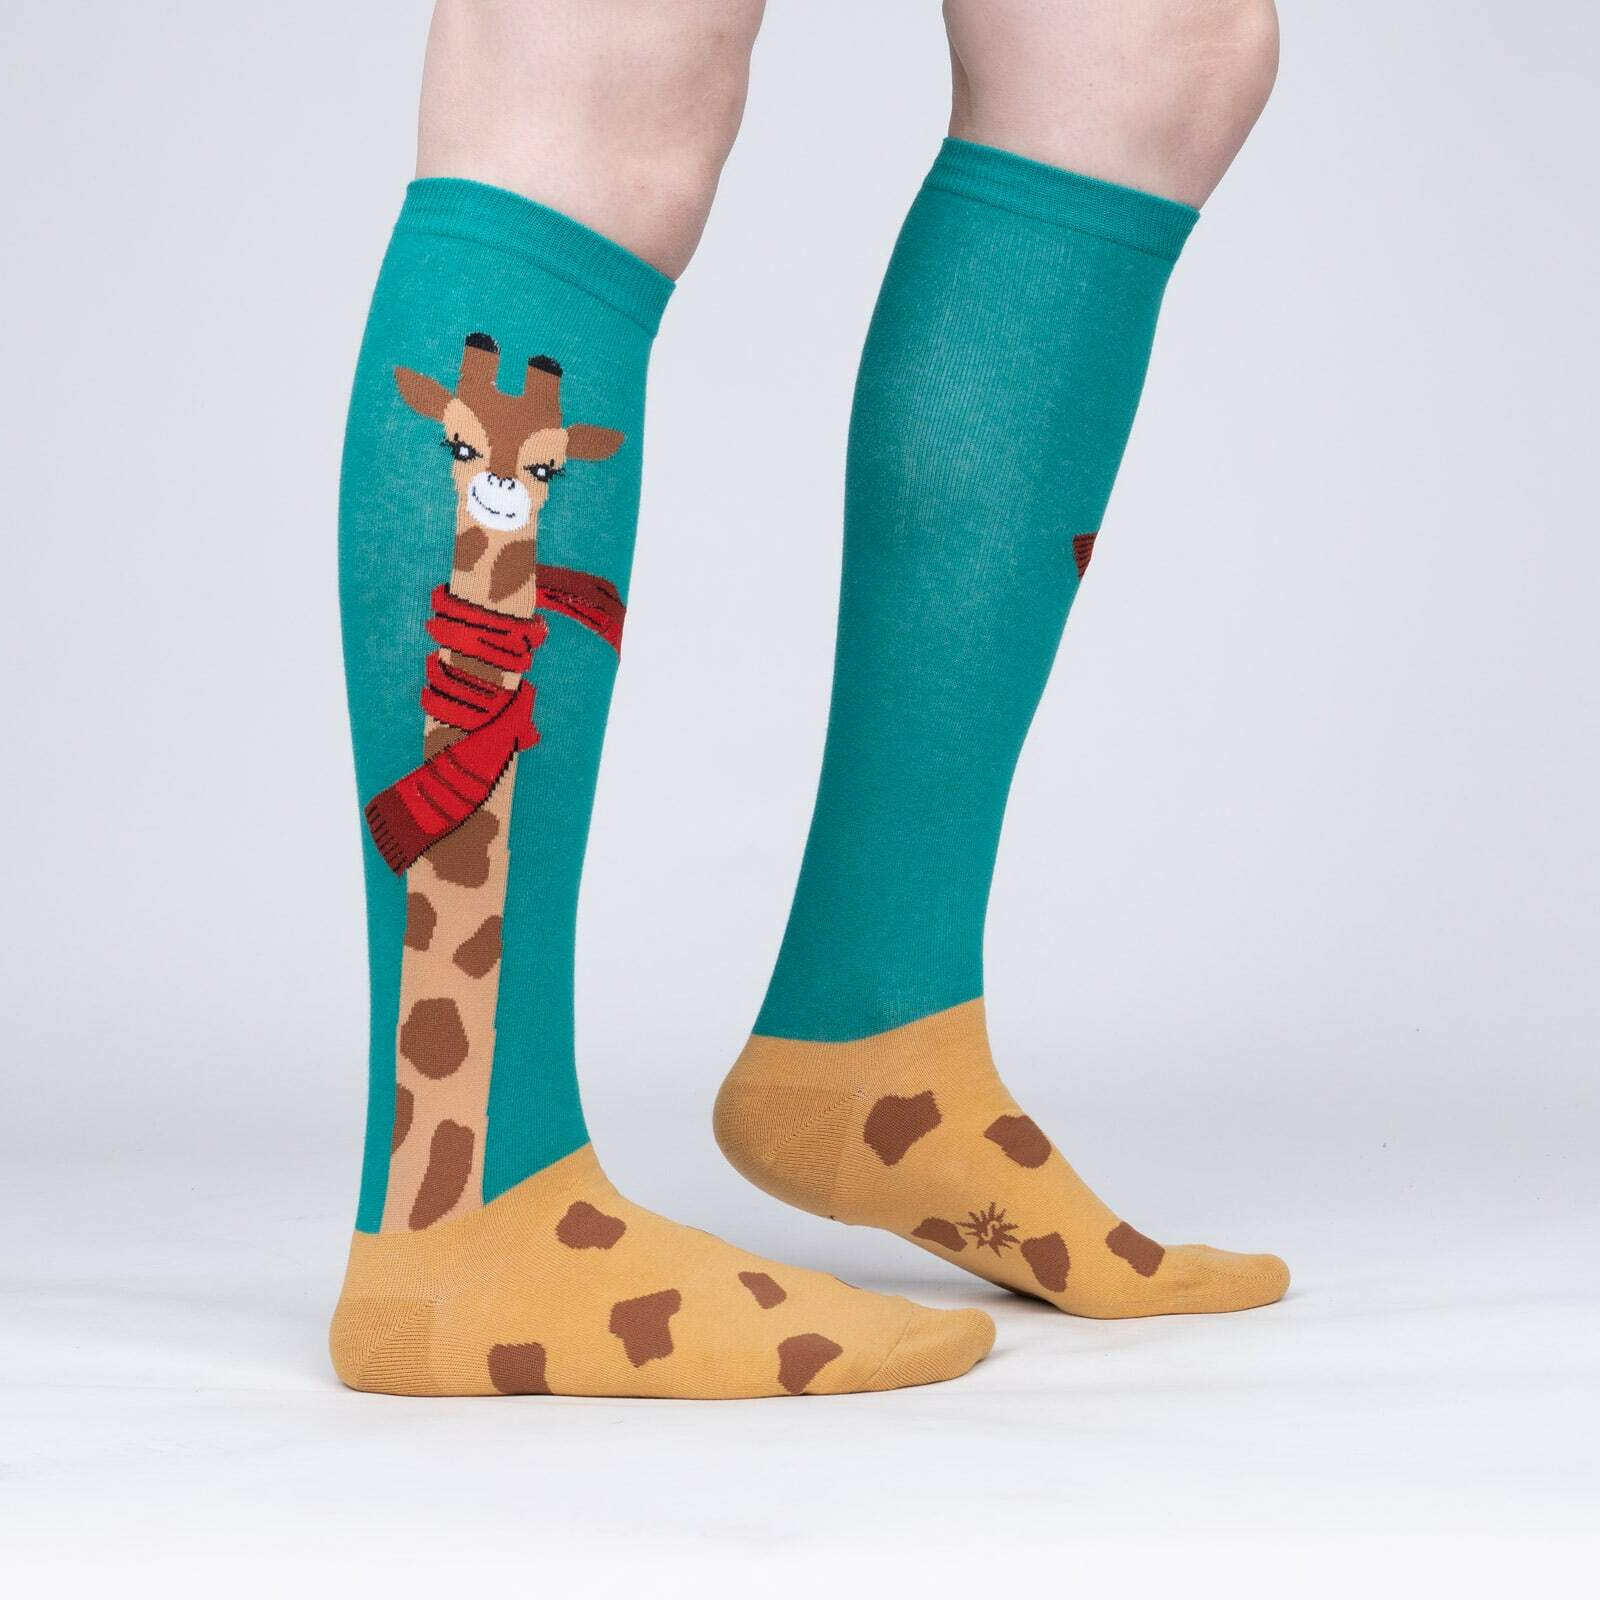 model side view of Bundled Up Up Up - Adorable Giraffe Winter Knee High Socks Green - Women's